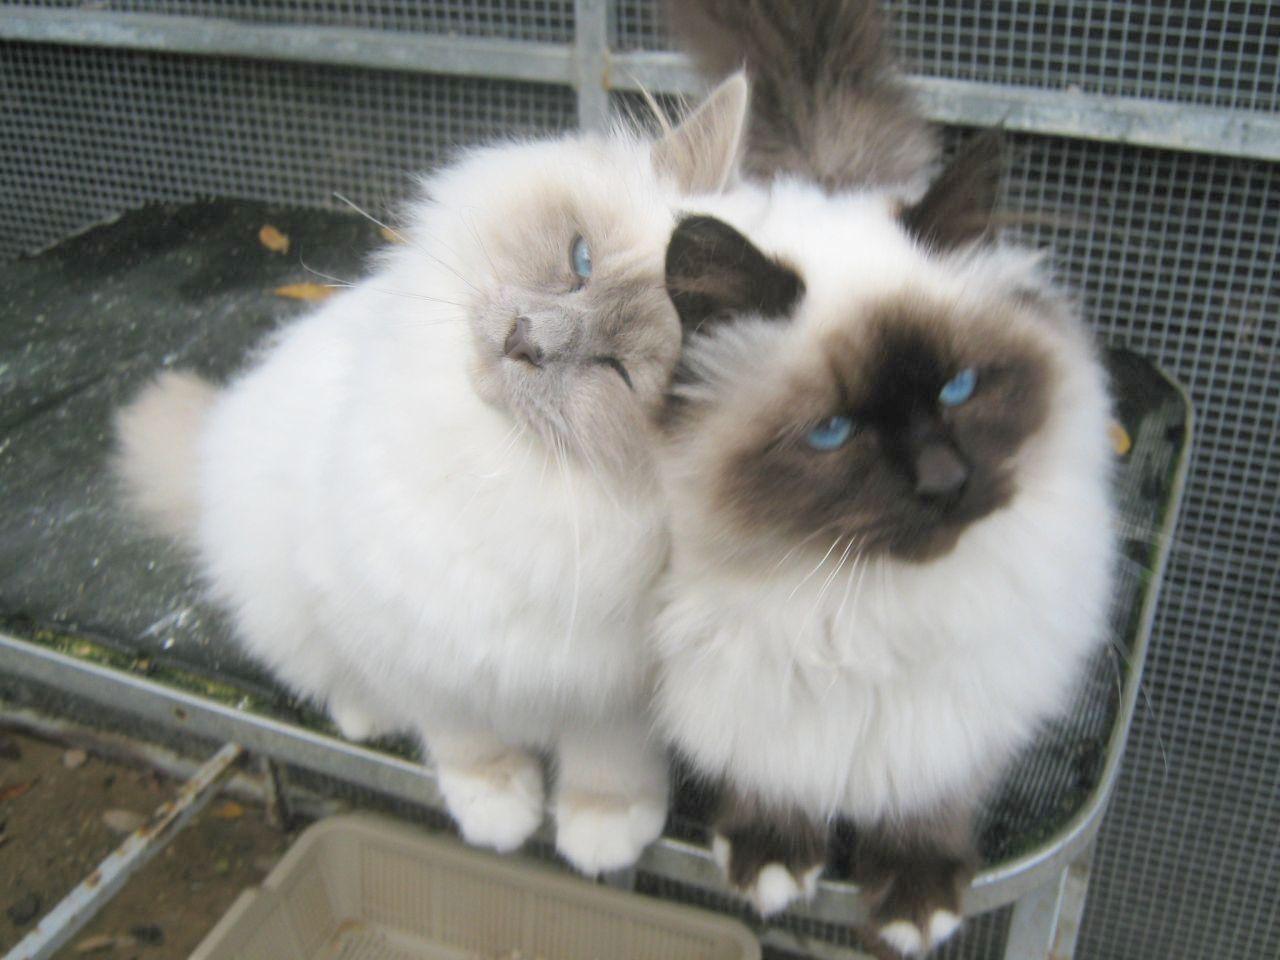 Cute Kittens Movies Cute Cats Easy Birman Kittens Cats Cute Cats